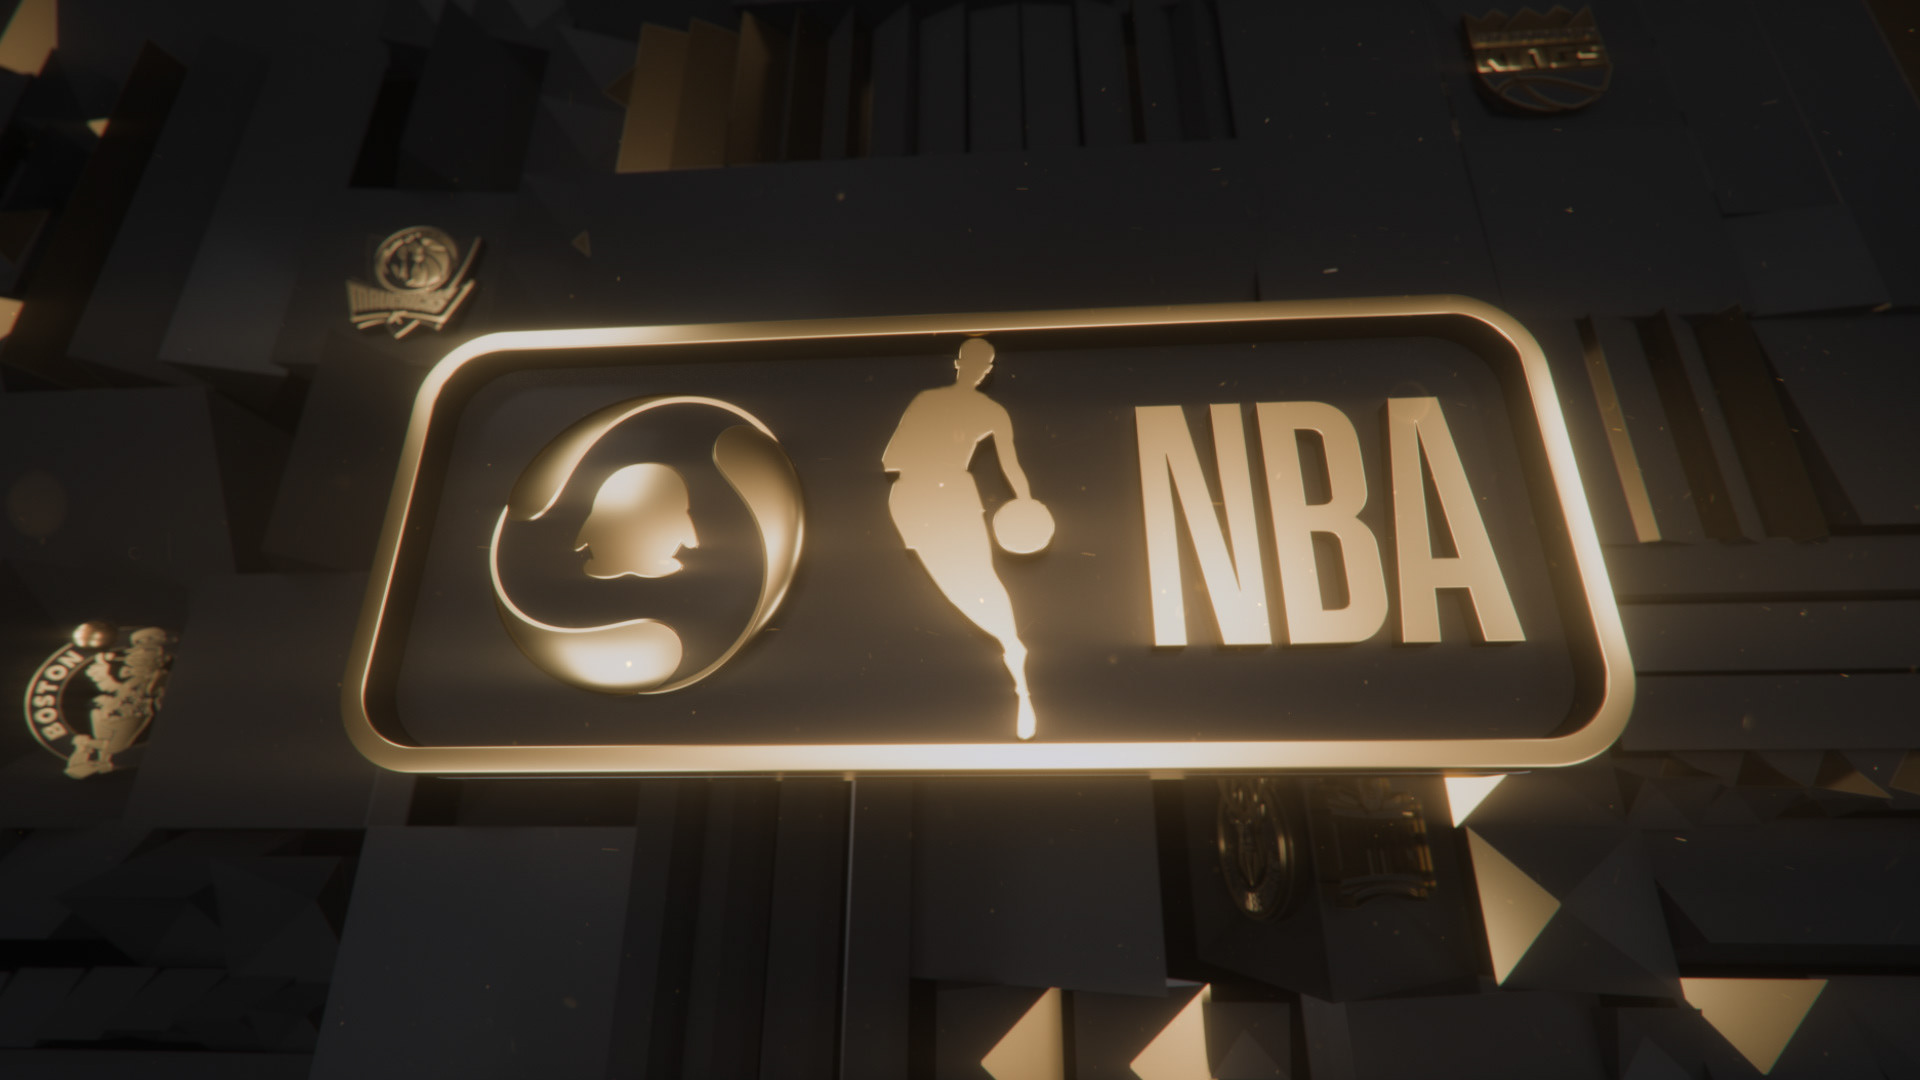 Chris Angelius - Motion Designer & Art Director - 2018 NBA on